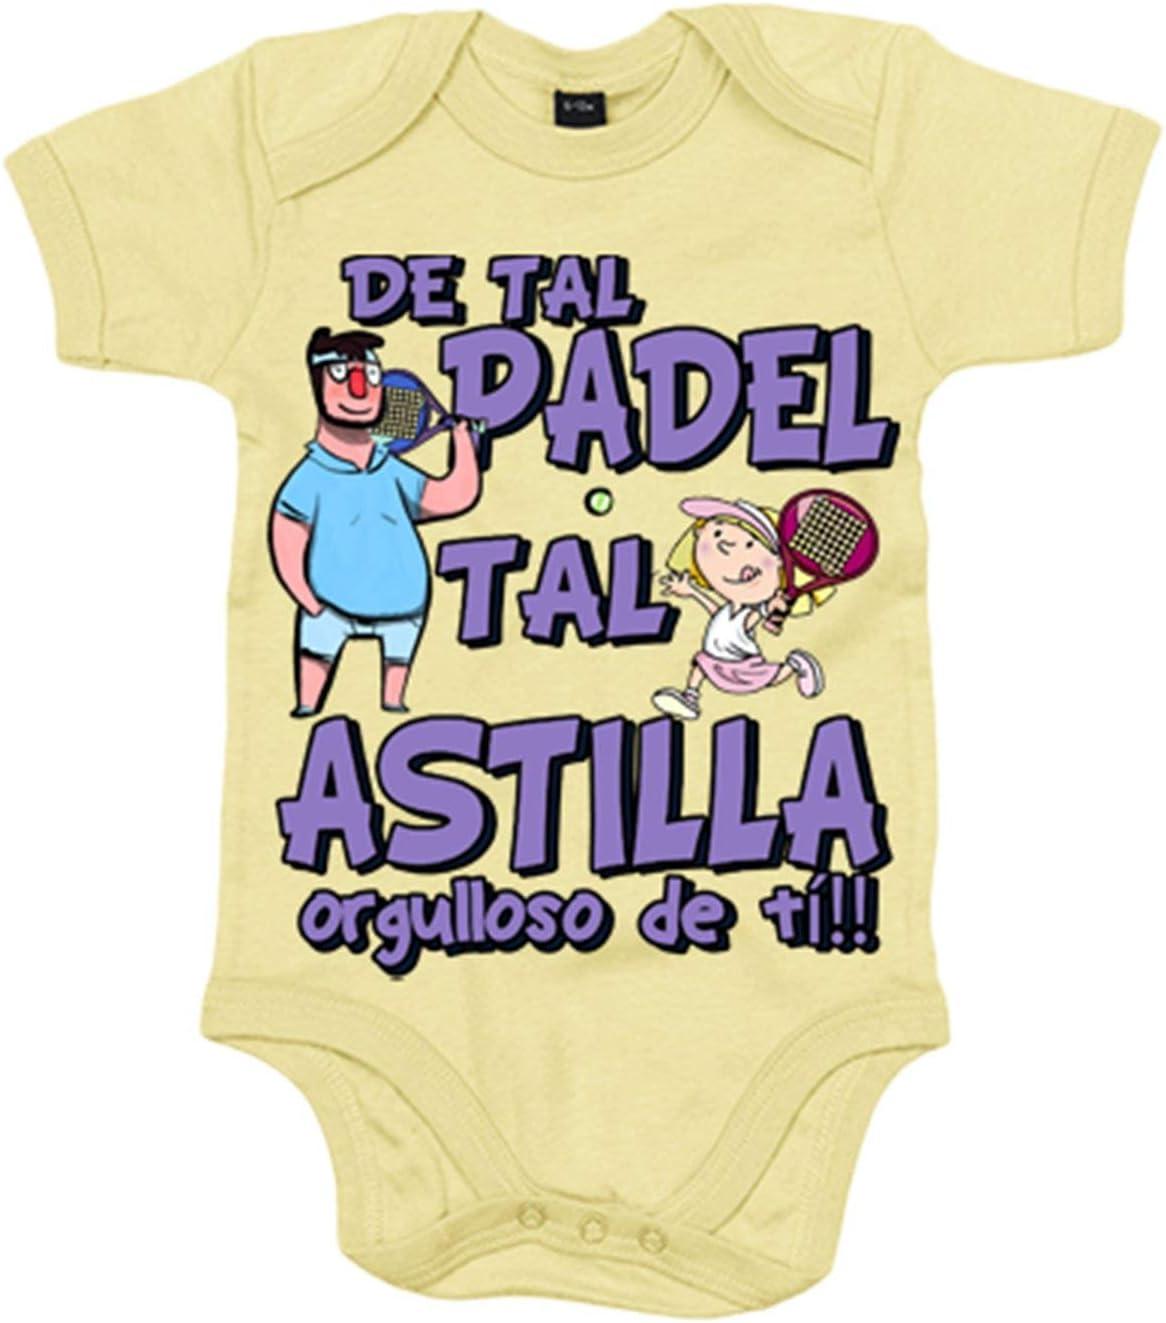 Body bebé padre y niña de tal padel tal astilla orgulloso de ti - Amarillo, 6-12 meses